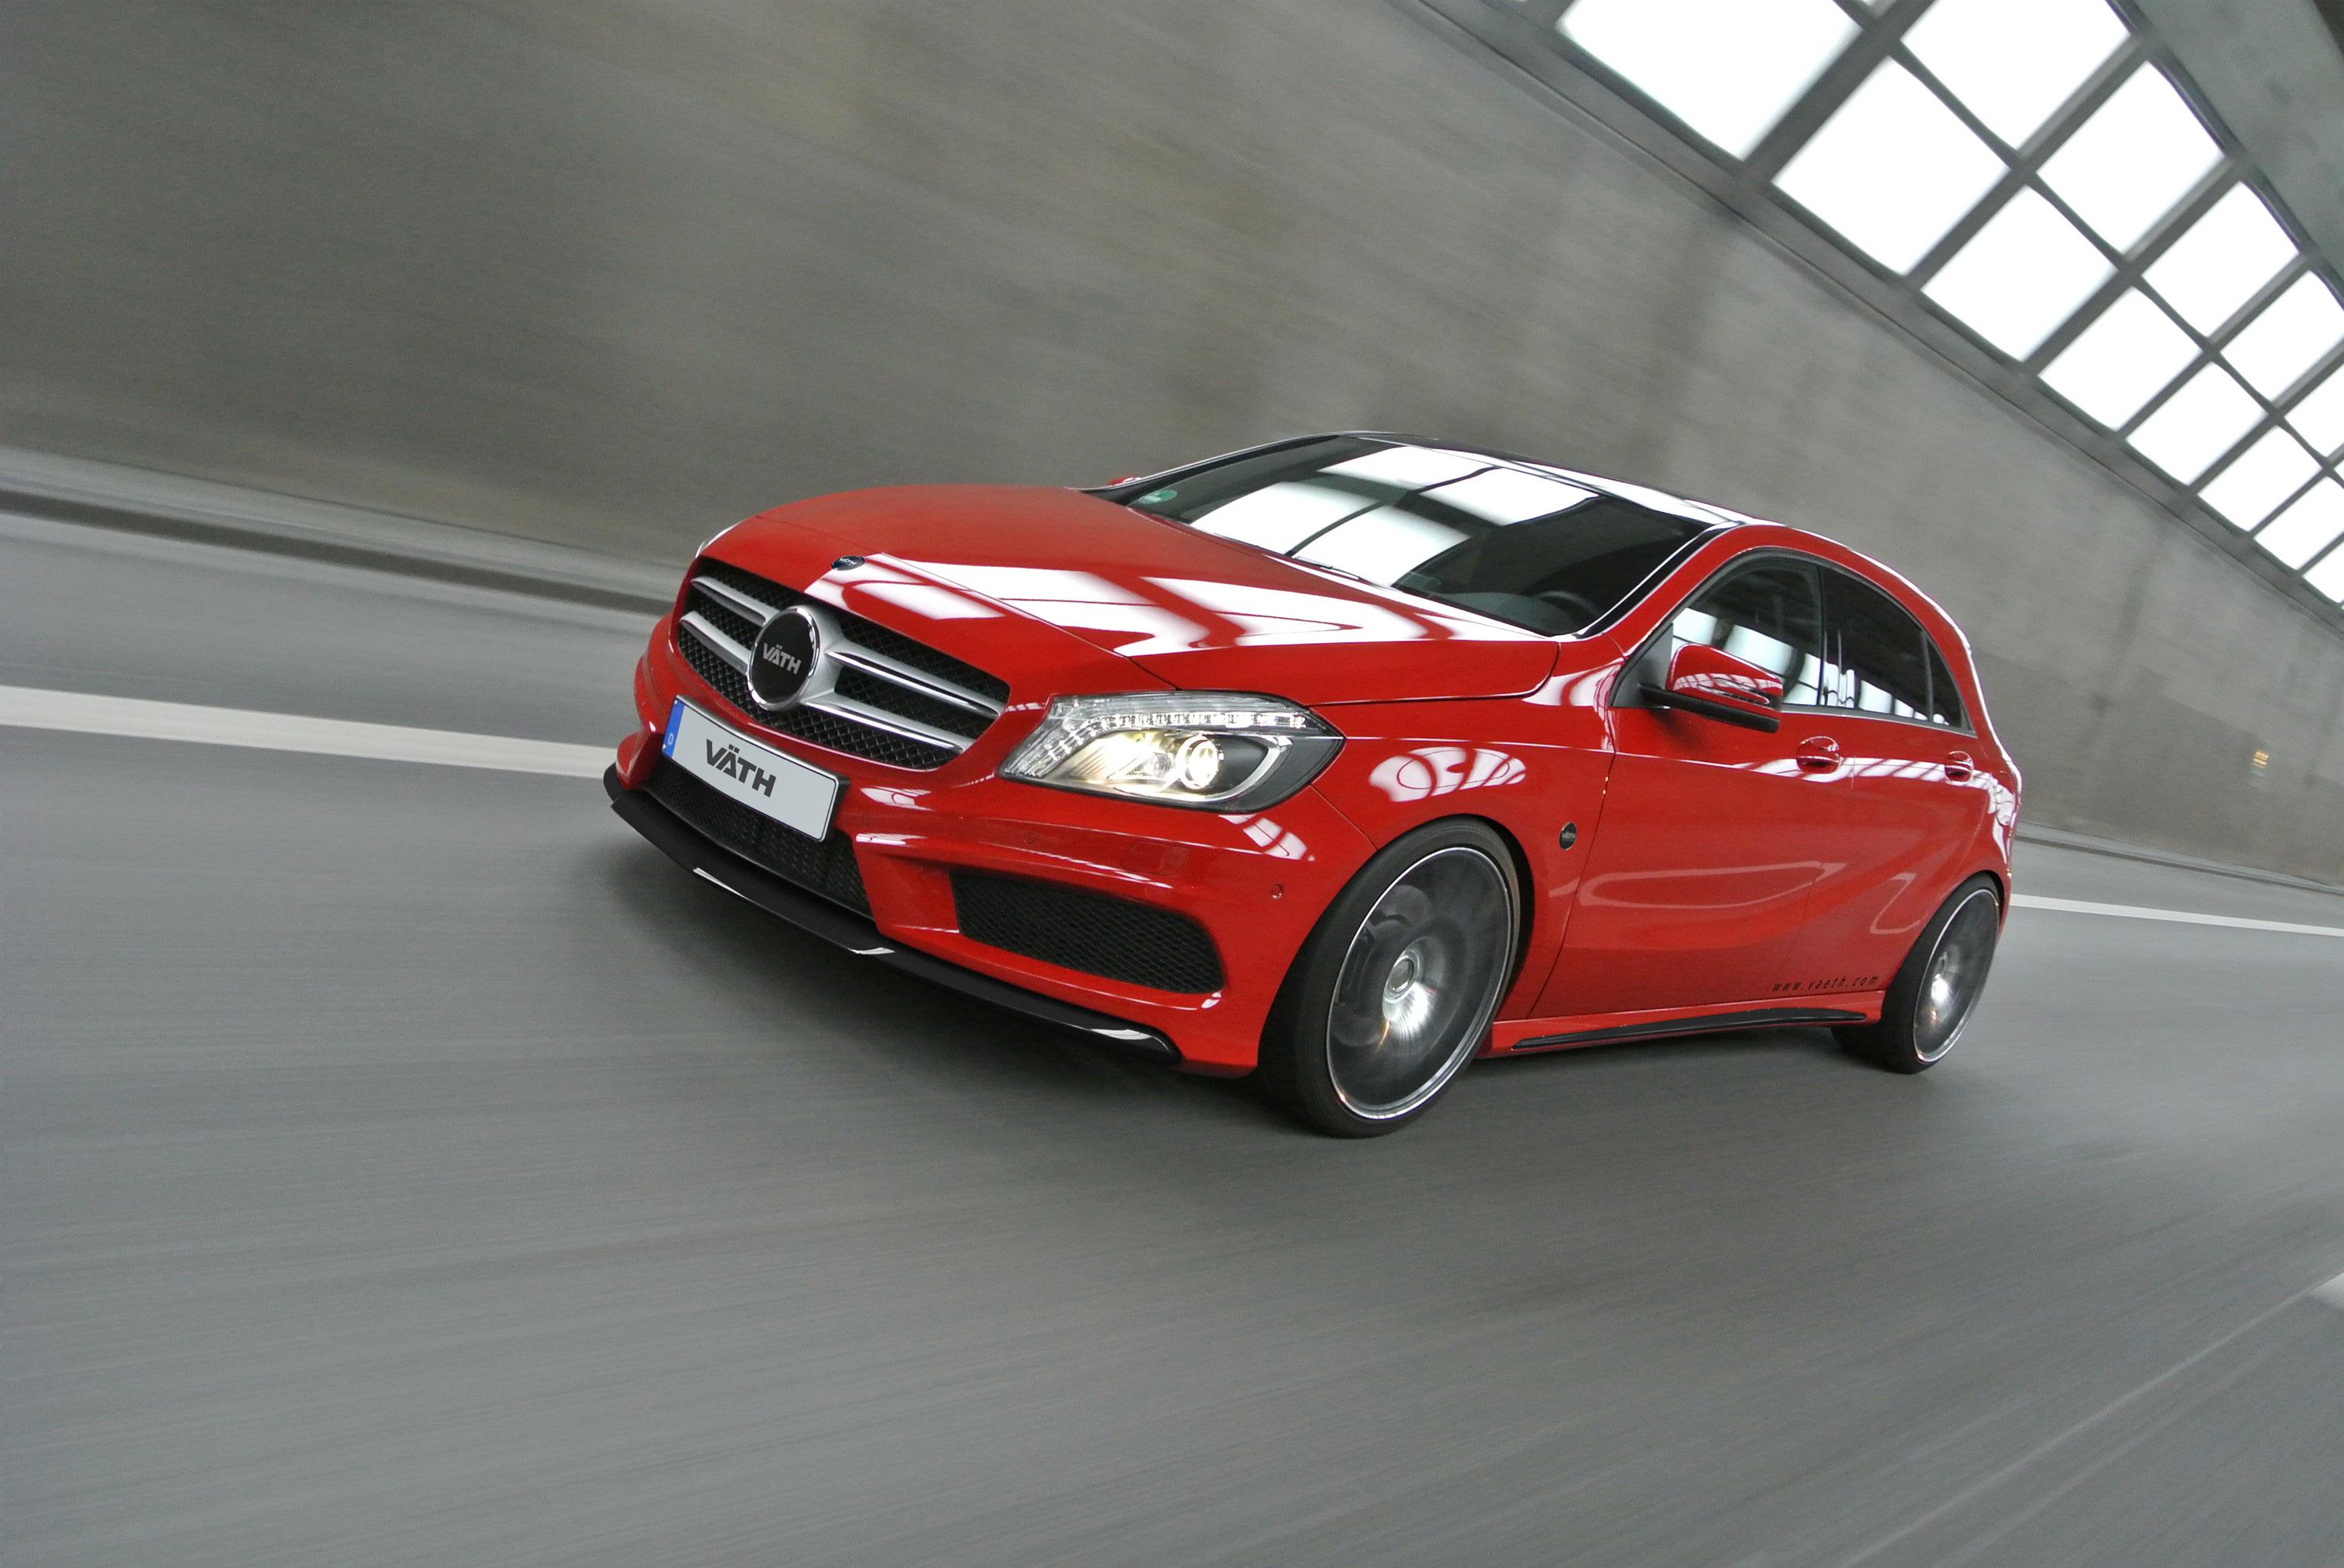 http://www.automobilesreview.com/img/vath-mercedes-benz-a-class-v25-reloaded/vath-mercedes-benz-a-class-v25-reloaded-01.jpg